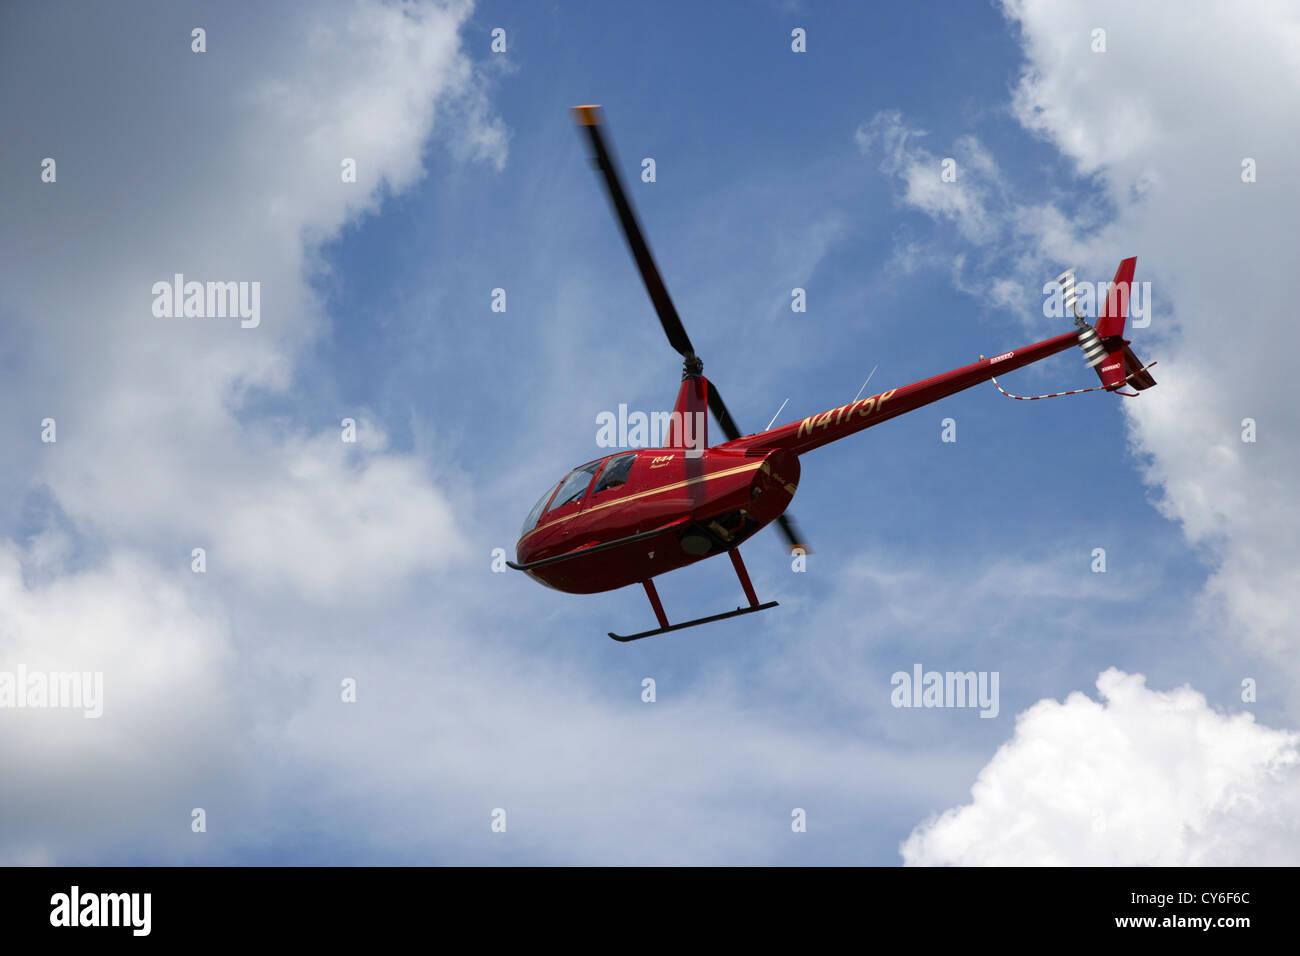 tourist light helicopter tour flight over kissimmee florida usa - Stock Image